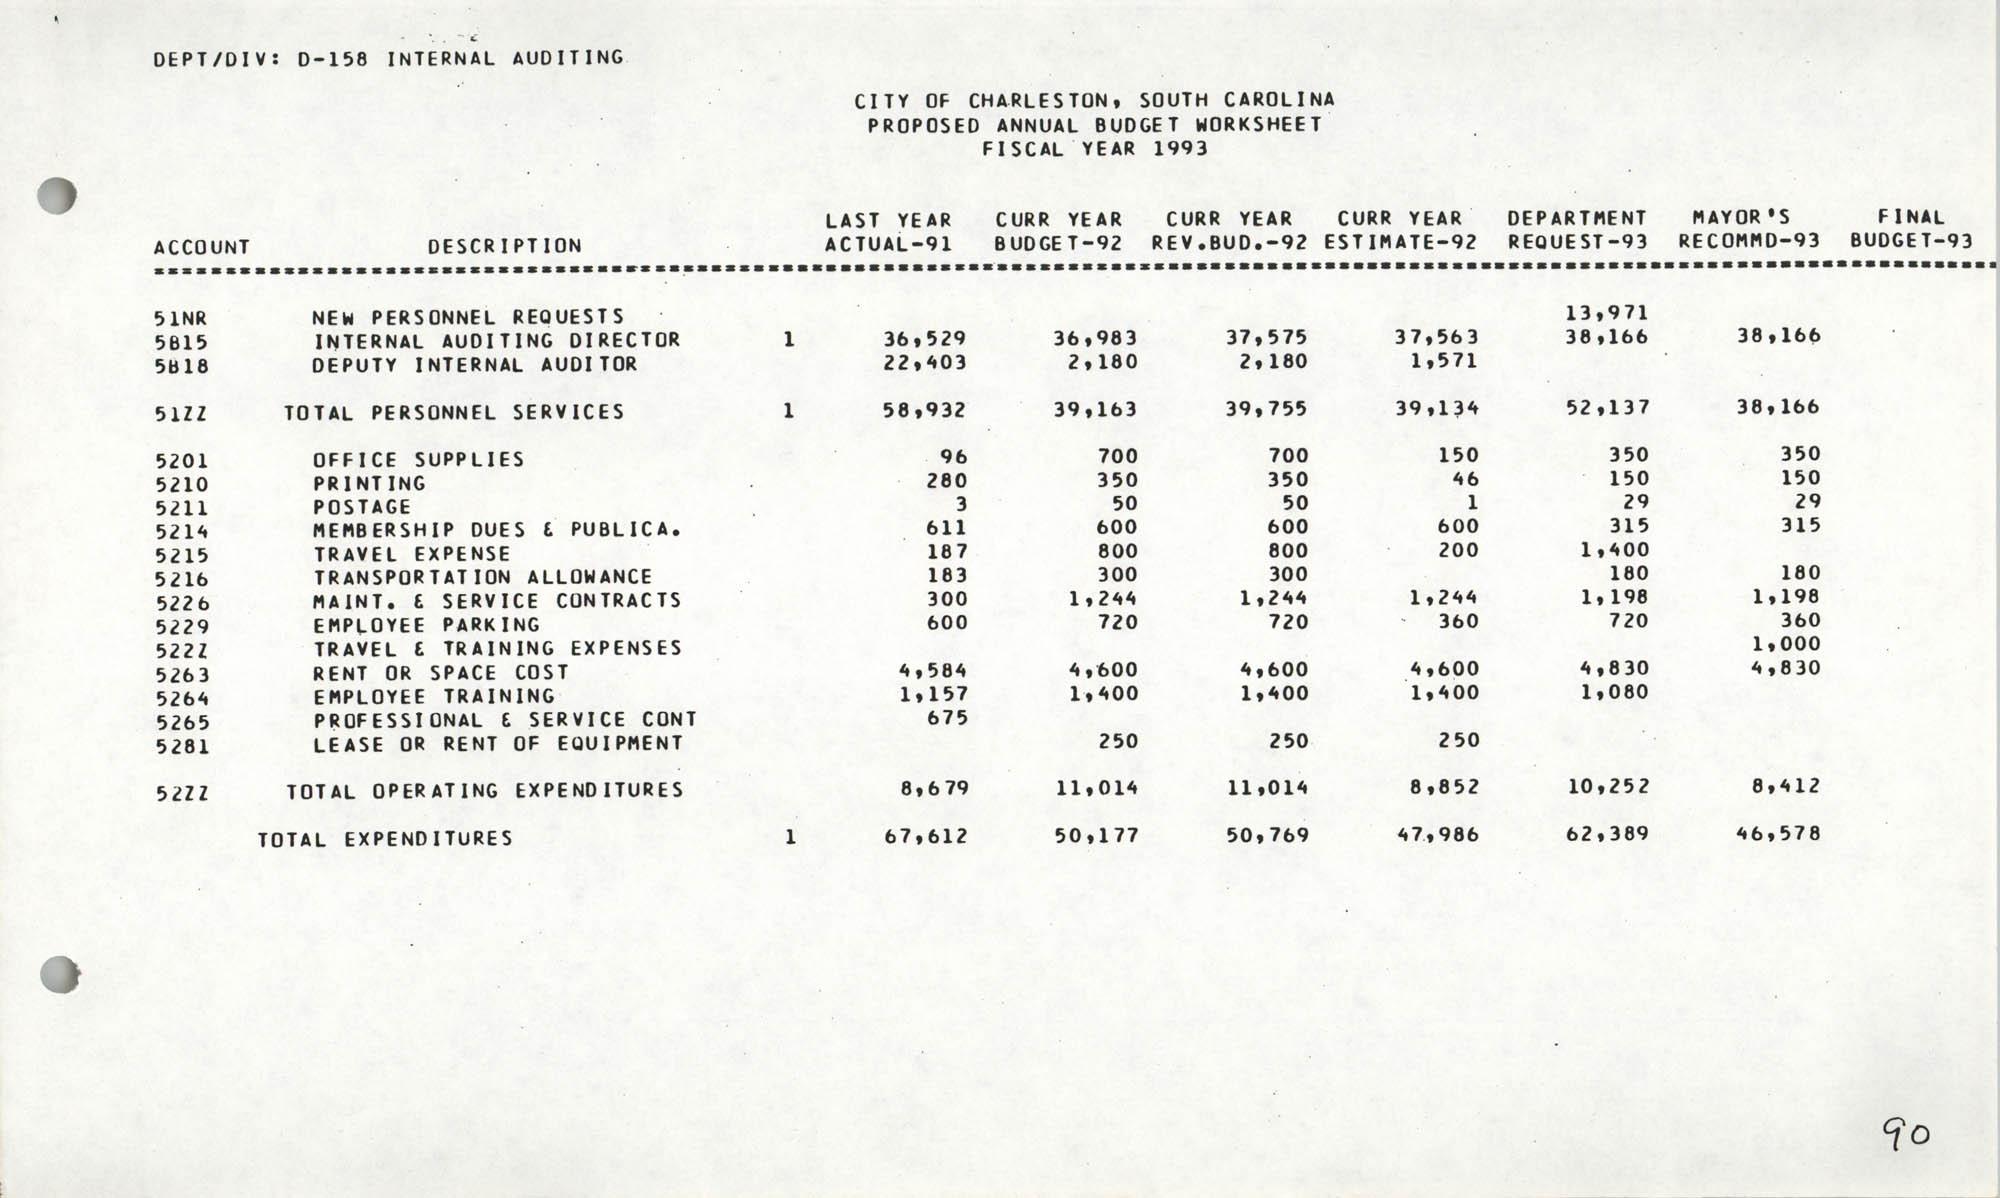 The City Council of Charleston, South Carolina, 1993 Budget, Page 90